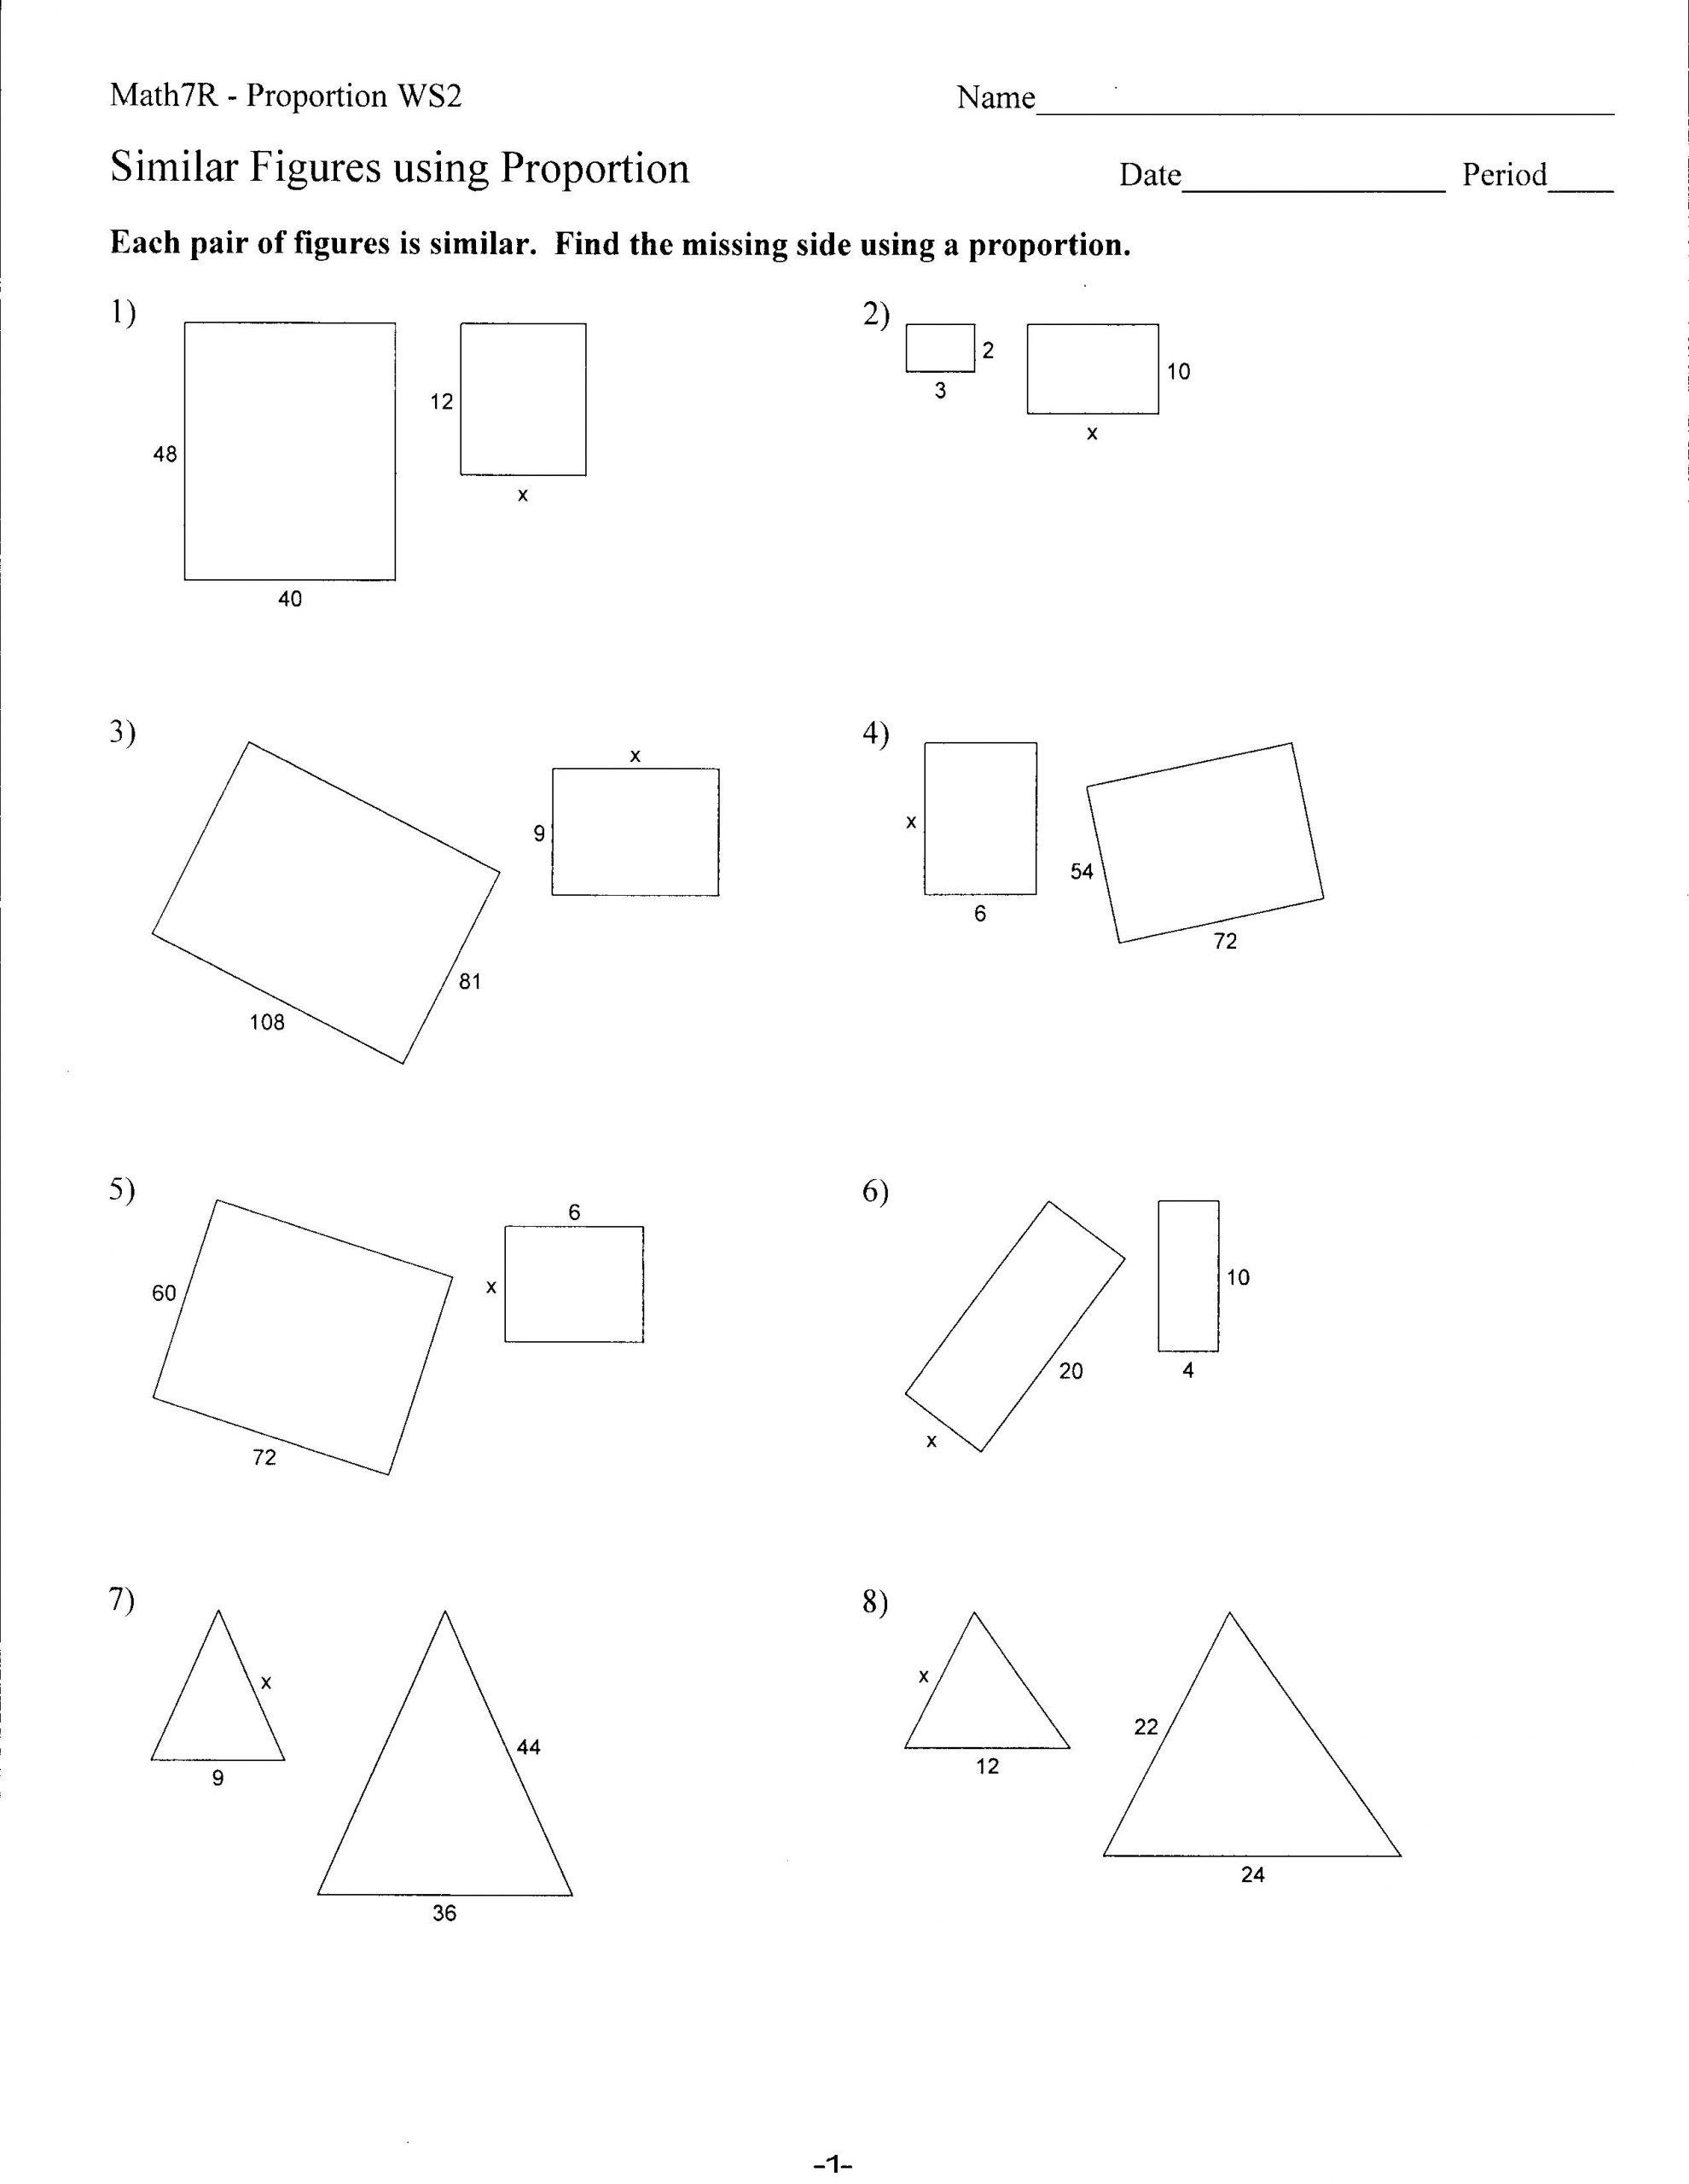 Similar Figures Worksheet Answer Key 29 Similar Shapes and Scale Drawings Worksheet Worksheet